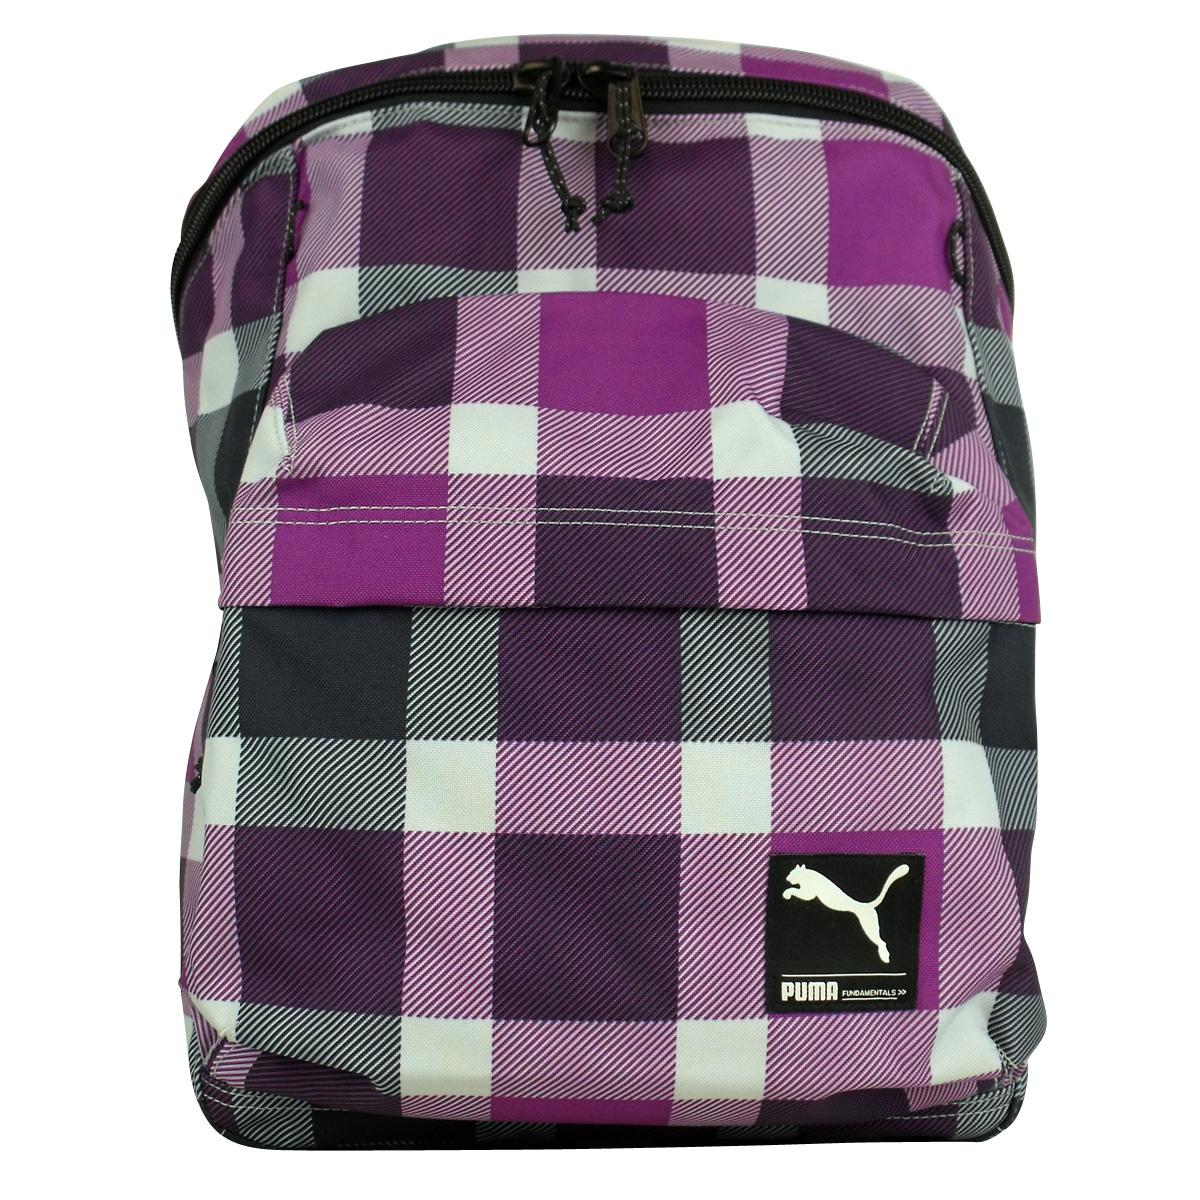 Boys Puma Student School Rucksack Backpack Mens Work Bag Girls Unisex Sports - eBay